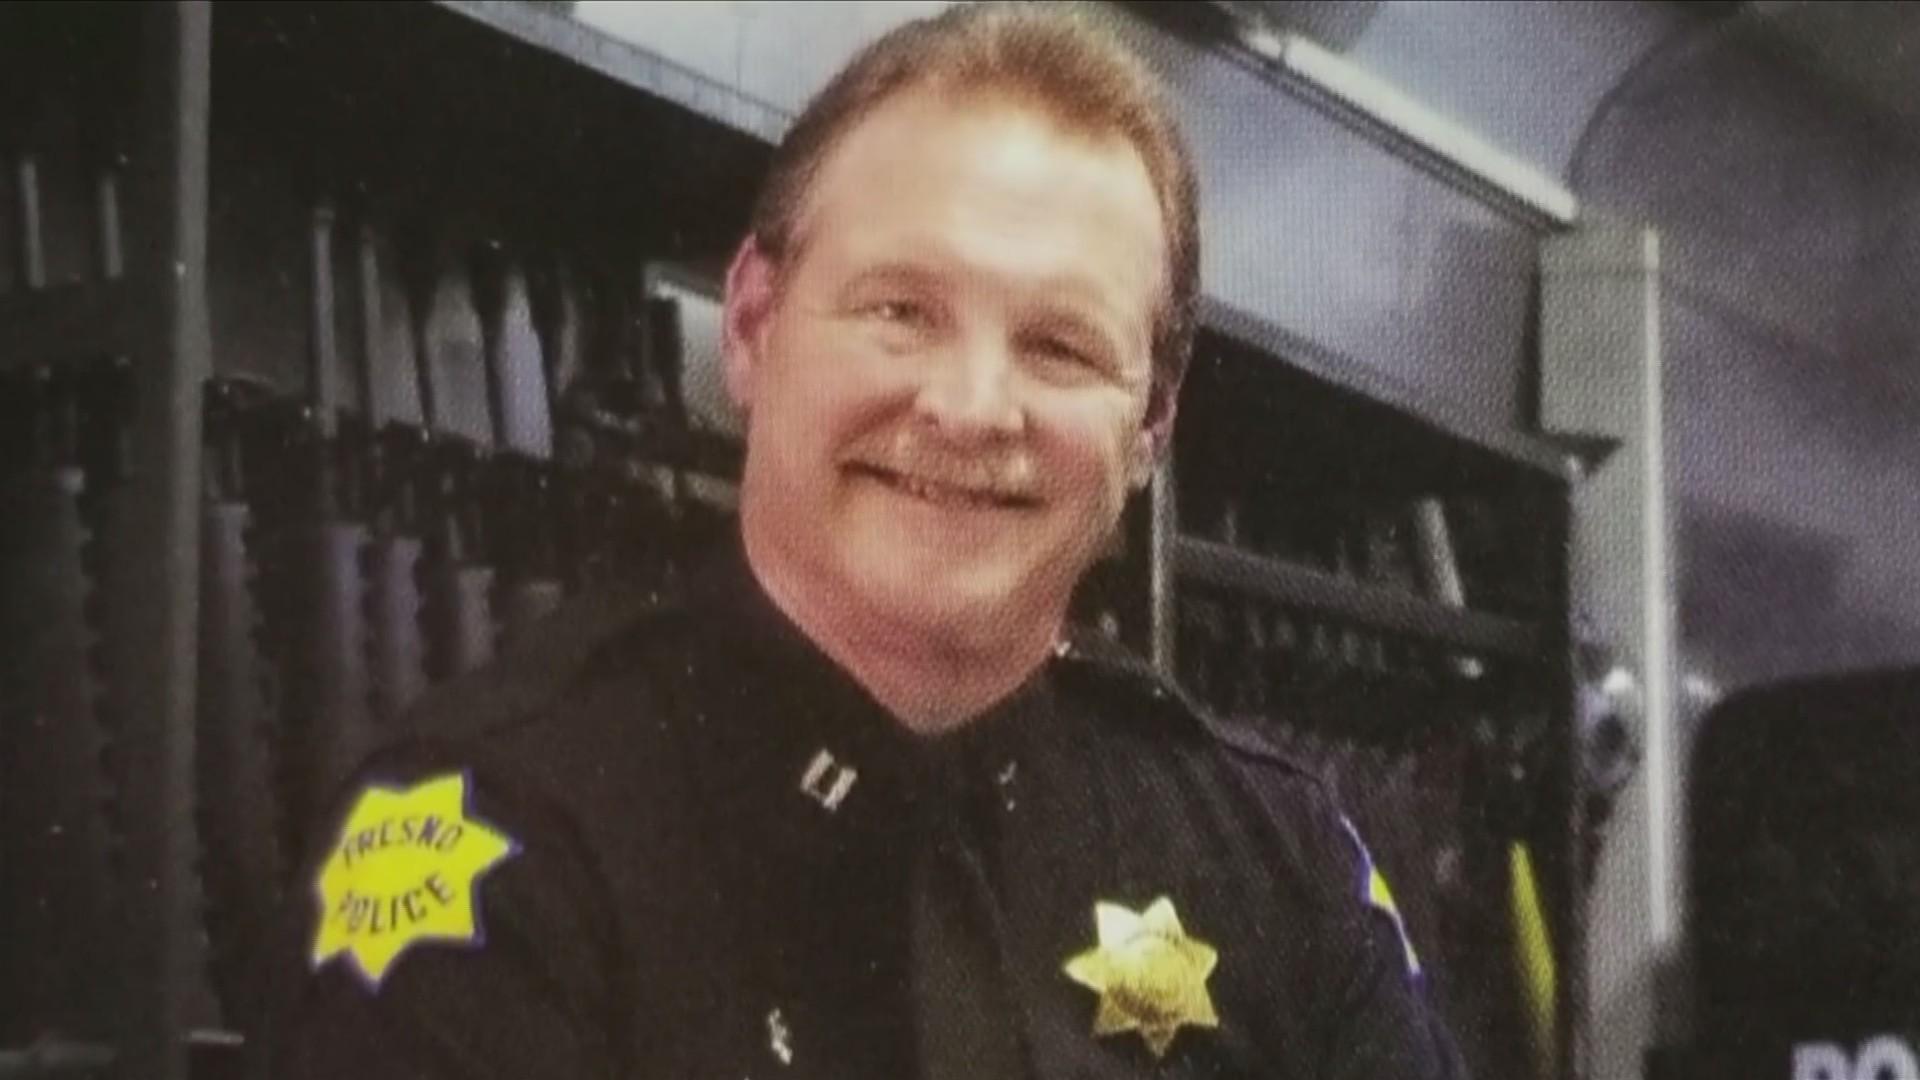 Man_shot__killed_in_officer_involved_sho_0_20181113025241